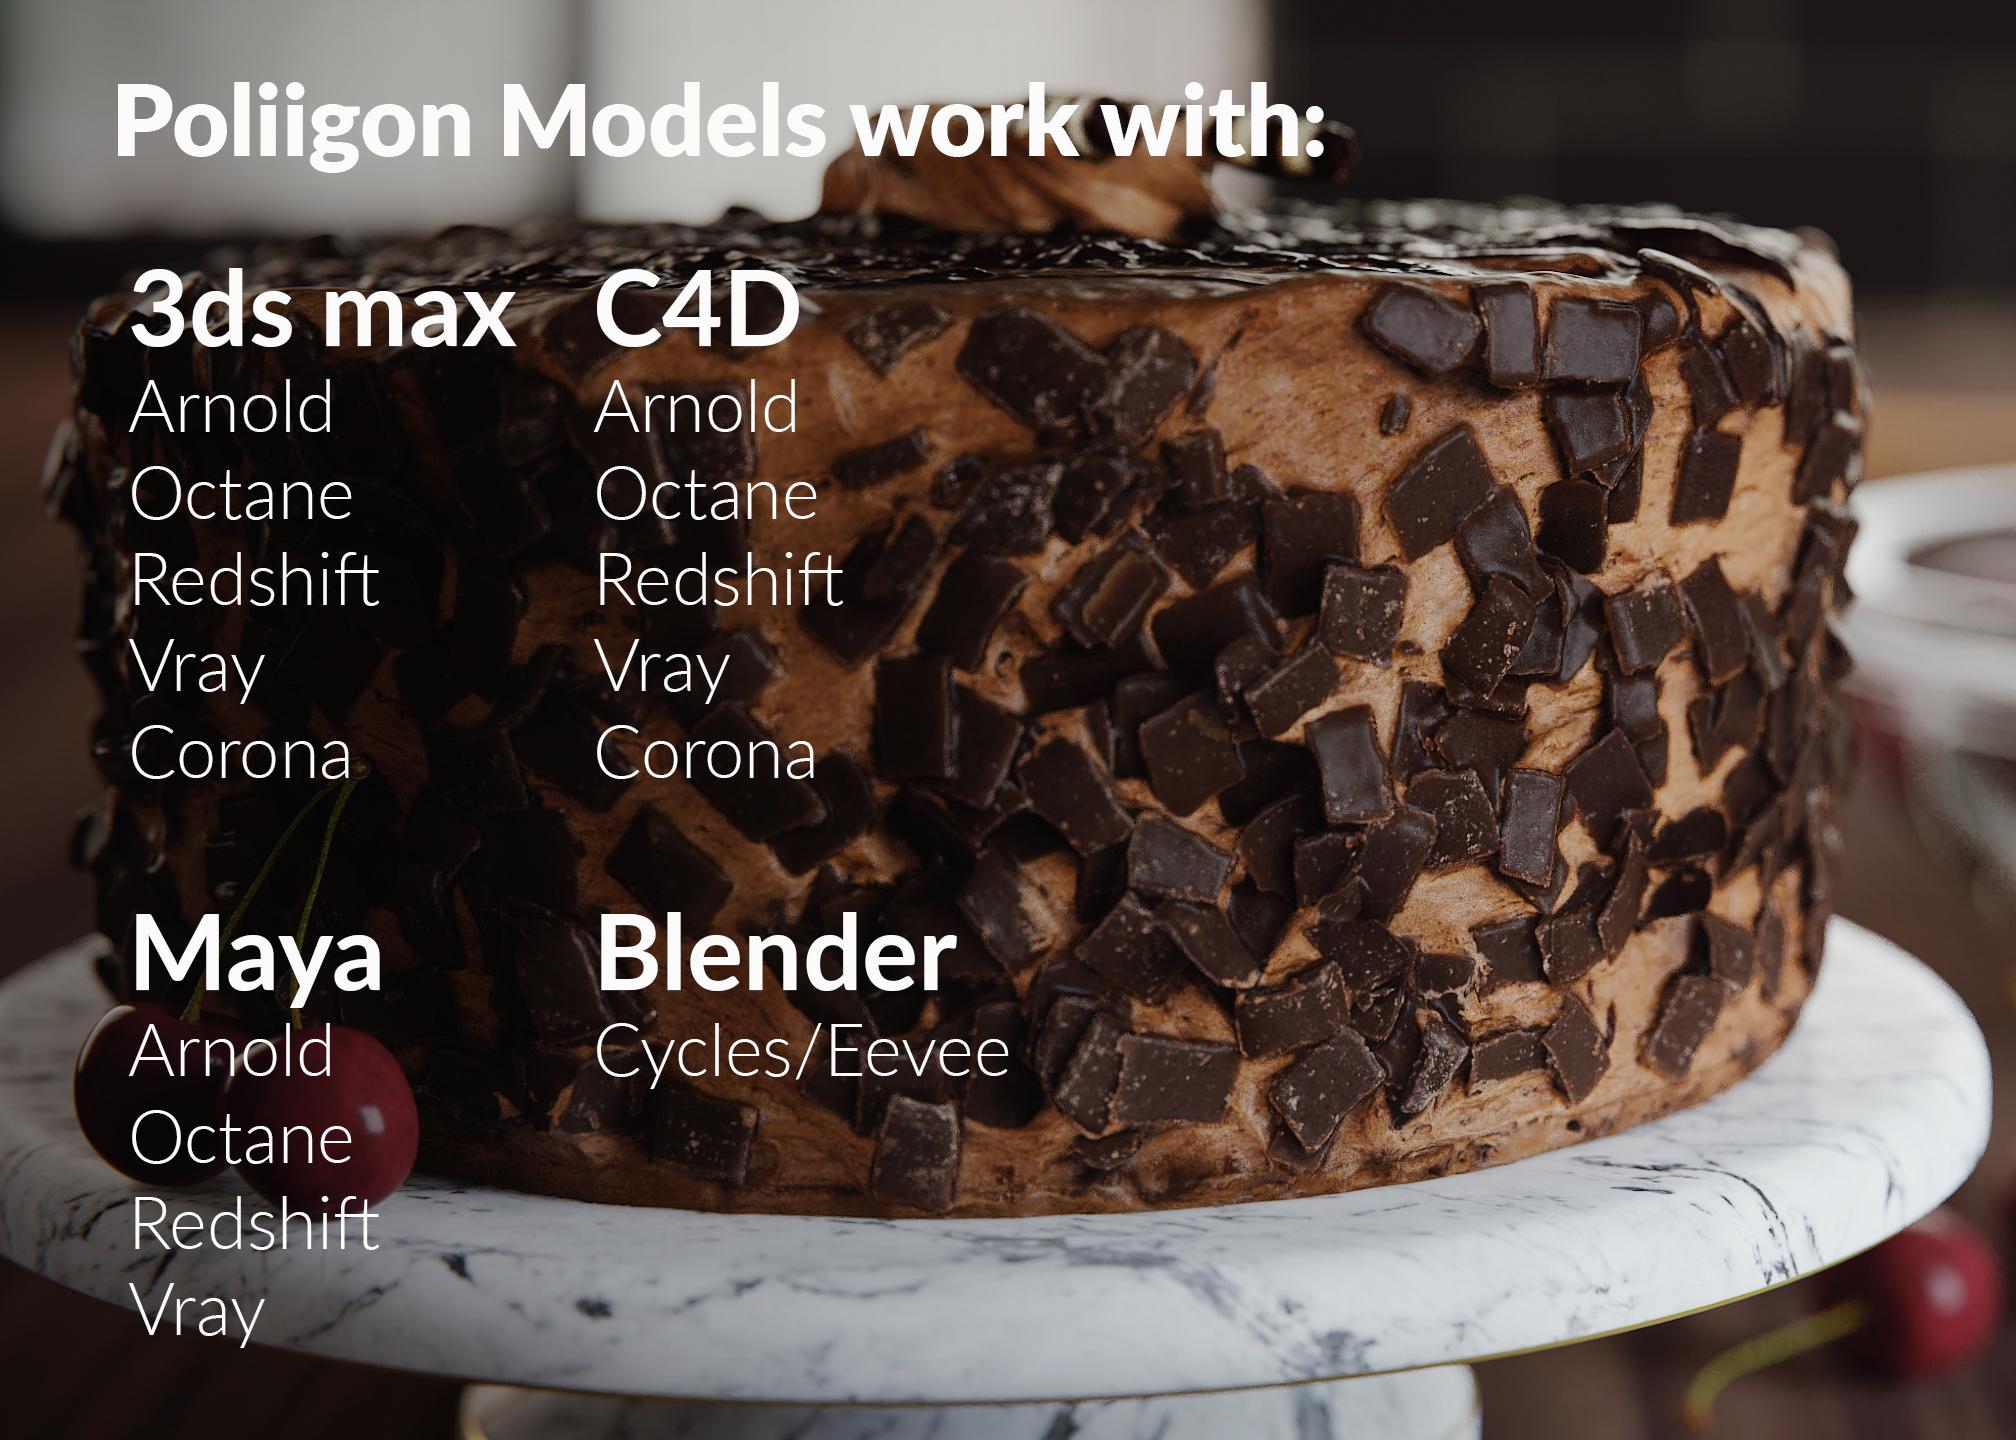 poliigon models work with.jpg